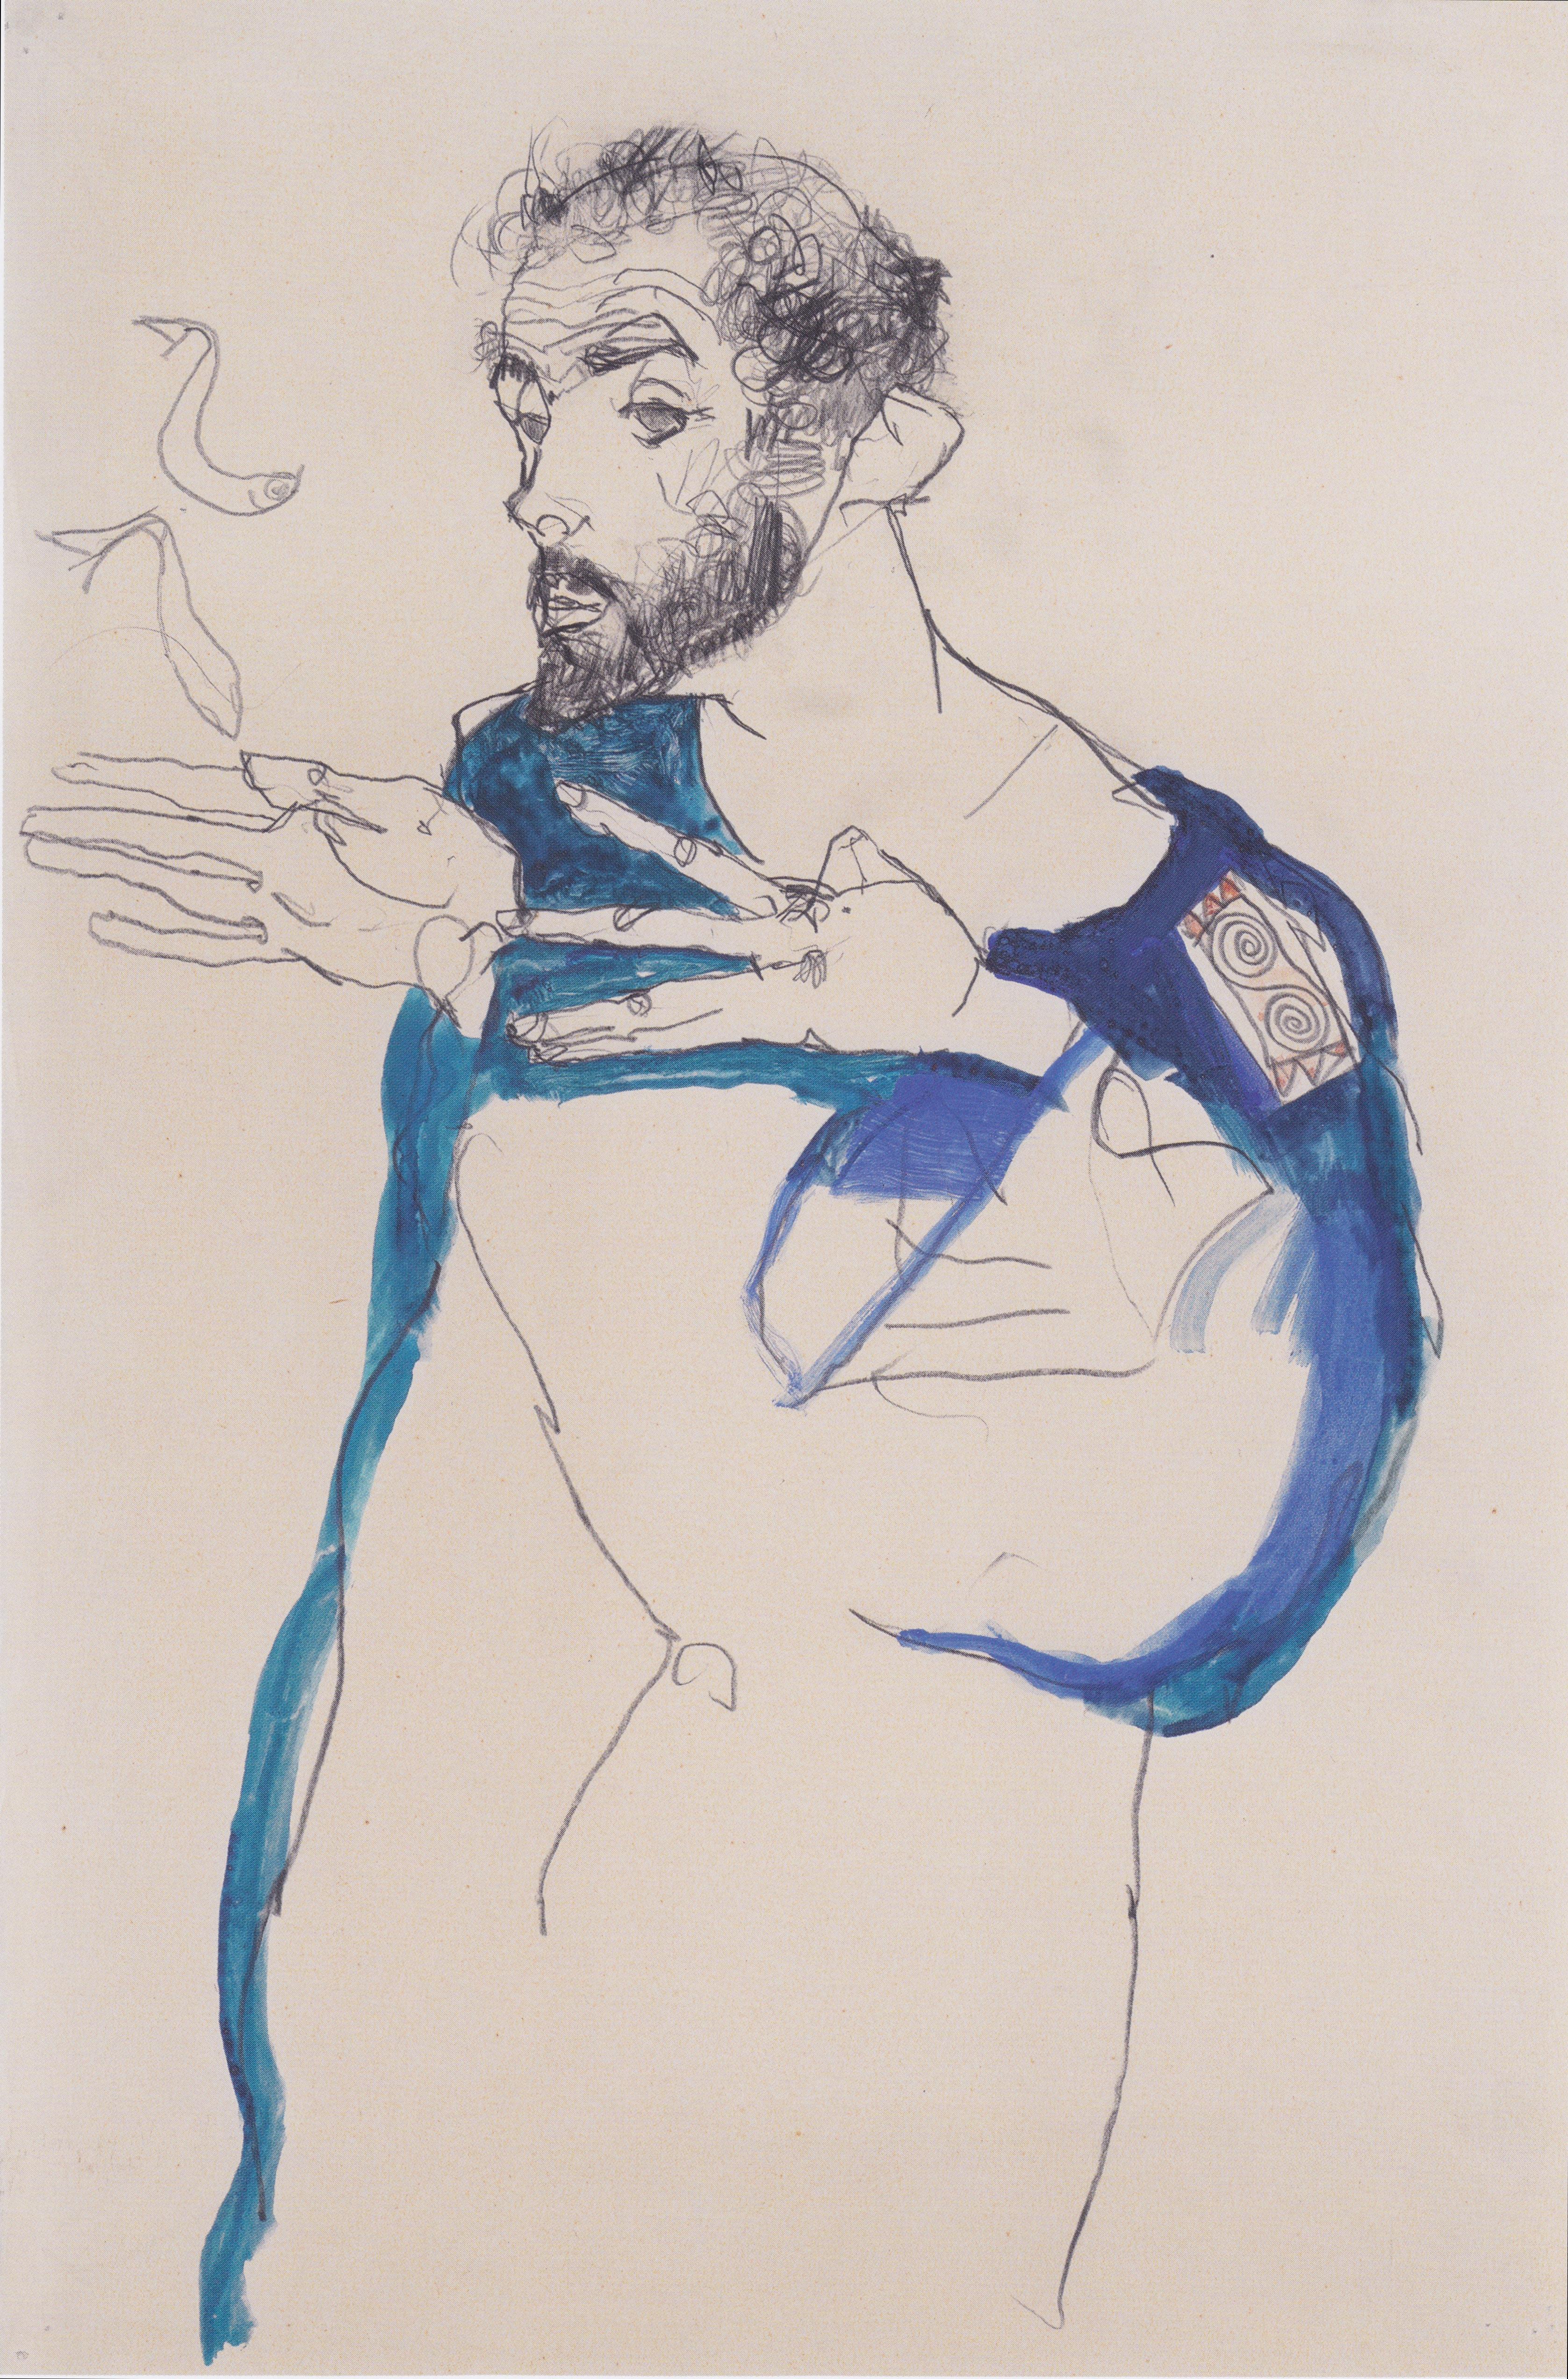 https://upload.wikimedia.org/wikipedia/commons/5/58/Egon_Schiele_-_Gustav_Klimt_im_blauen_Malerkittel_-_1913.jpeg